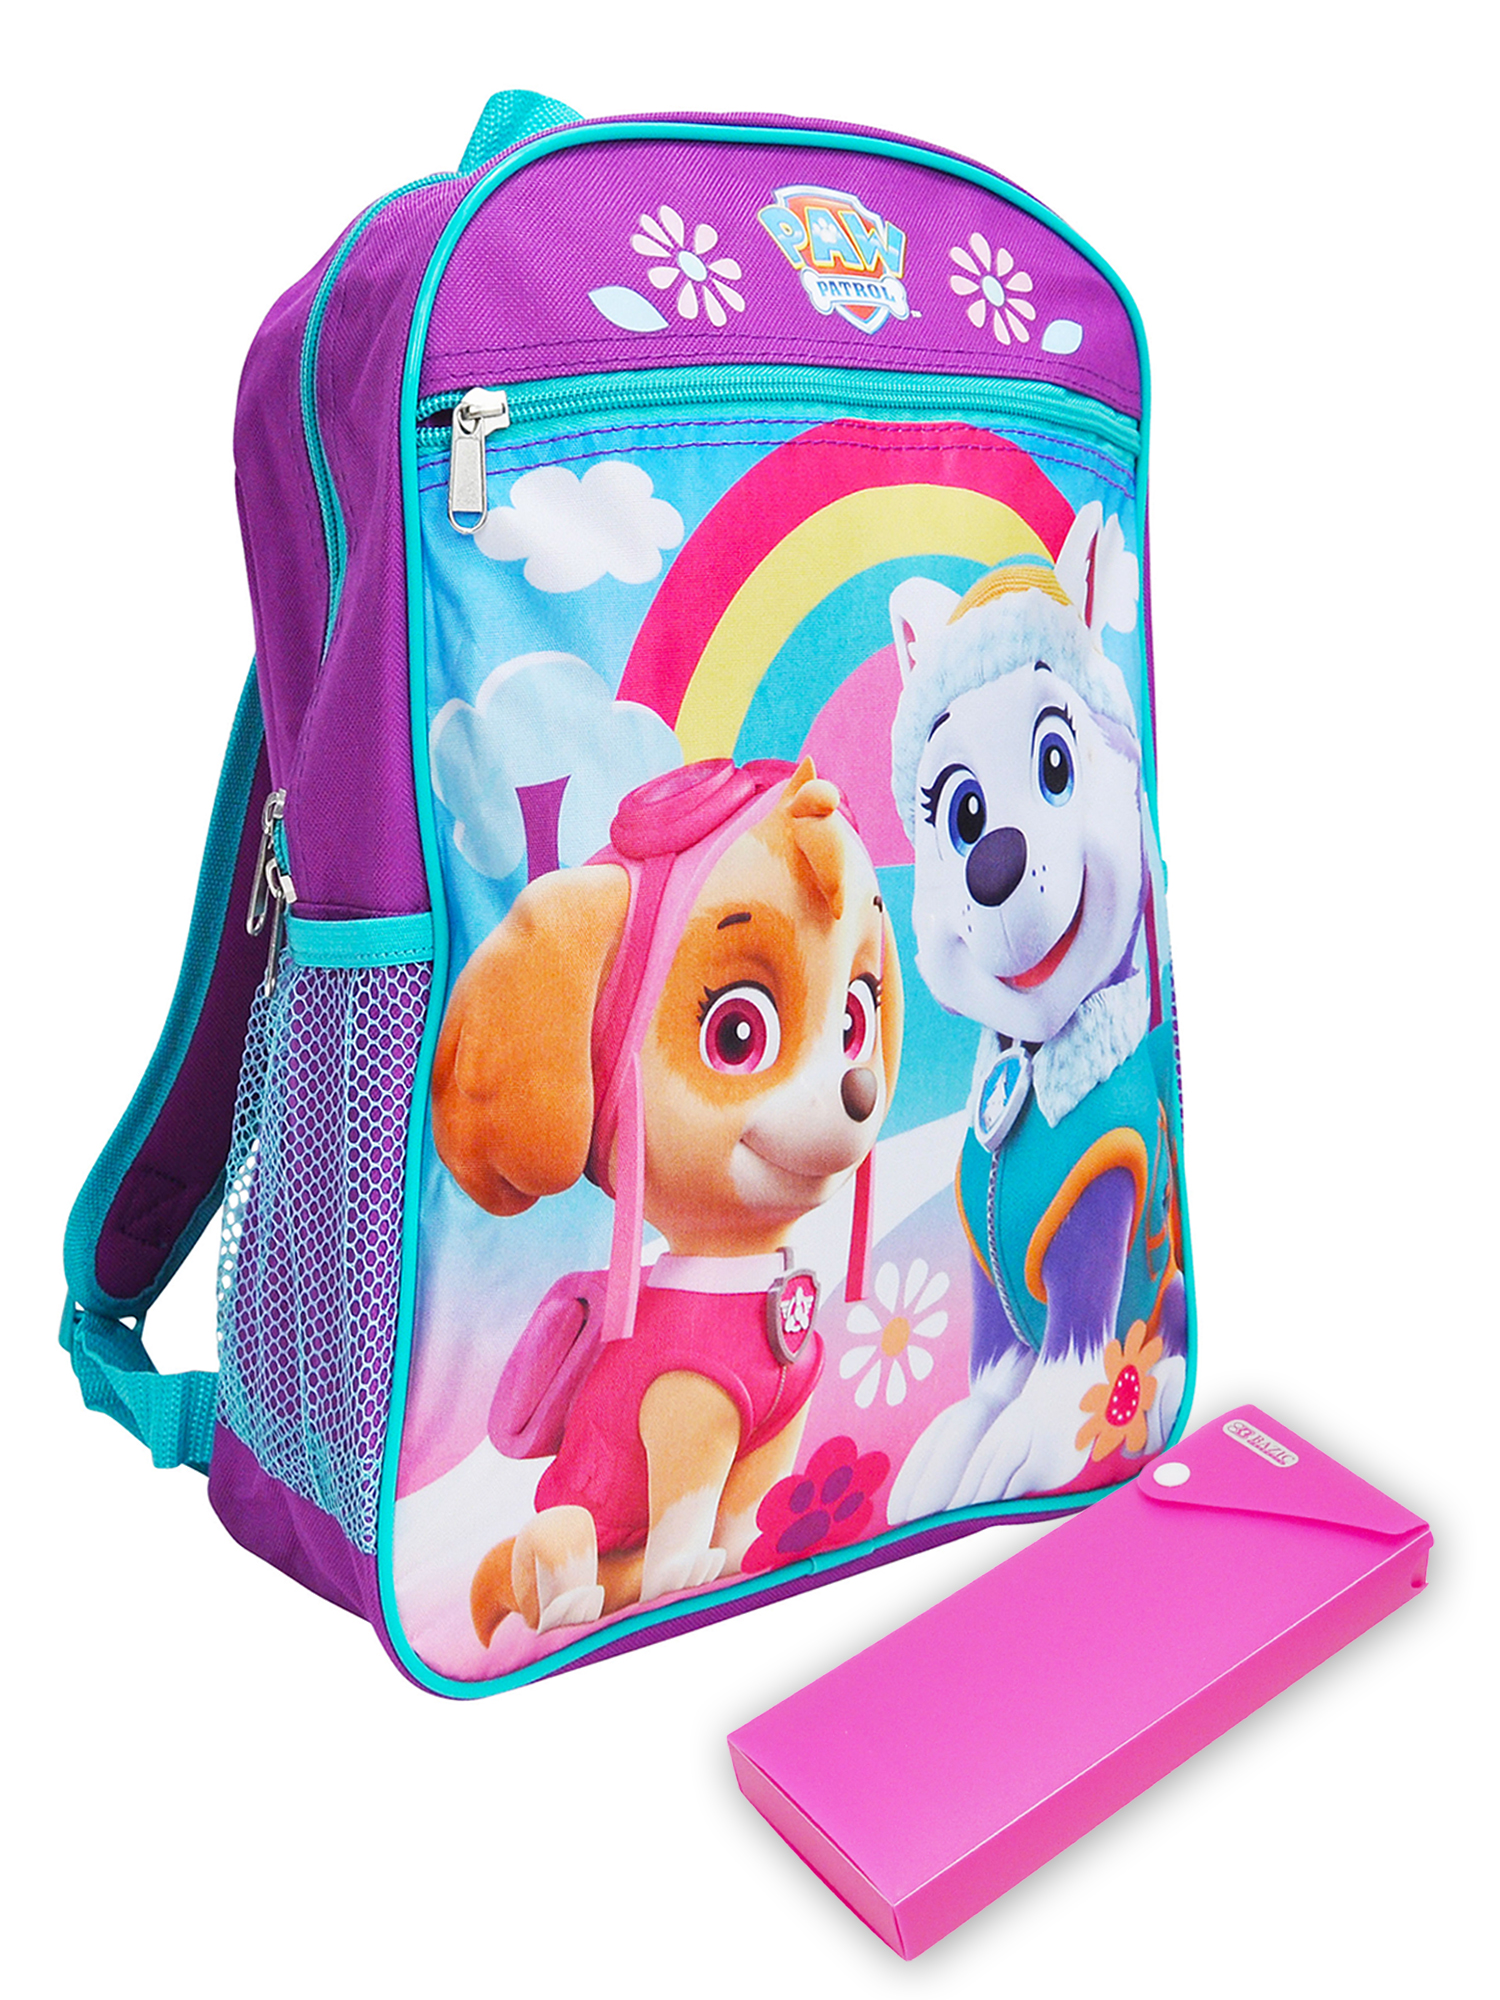 Boys-Girls-Backpack-15-034-amp-Pencil-Case-Paw-Patrol-Disney-Marvel-CHOOSE thumbnail 7